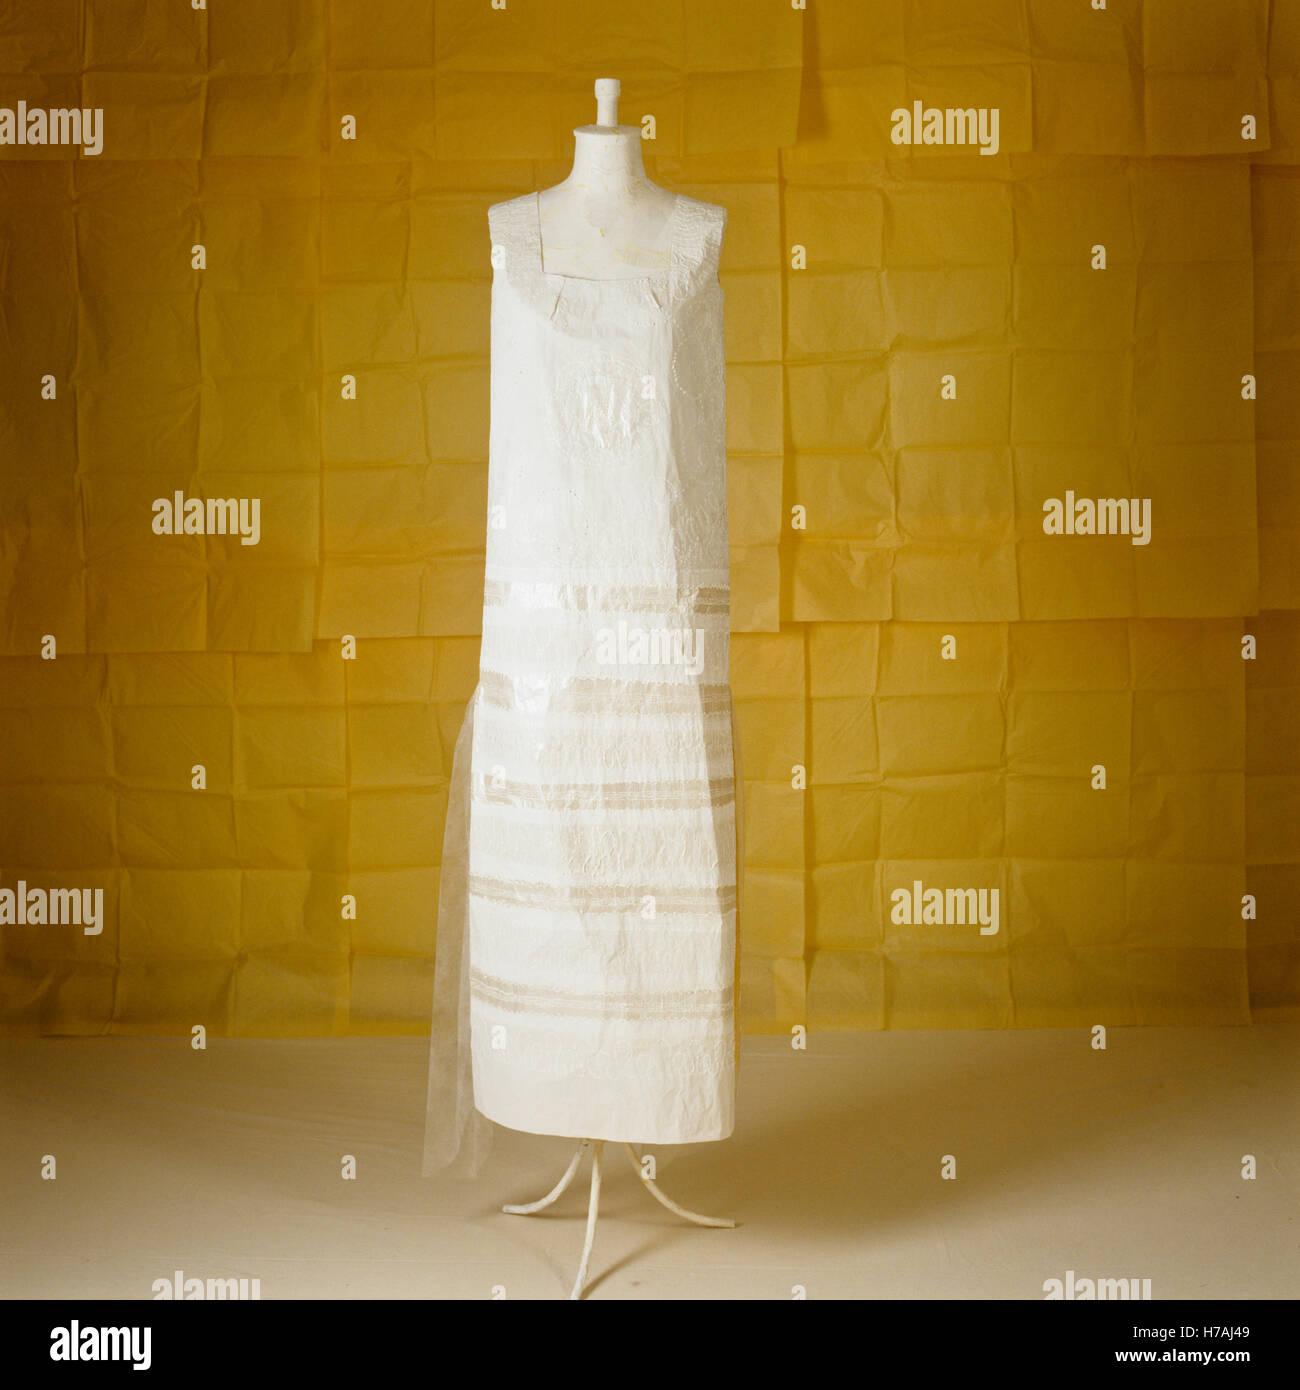 Camiseta sin mangas blanca 1920s estilo histórico papel de réplica vestido por Isabelle de Borchgrave Imagen De Stock